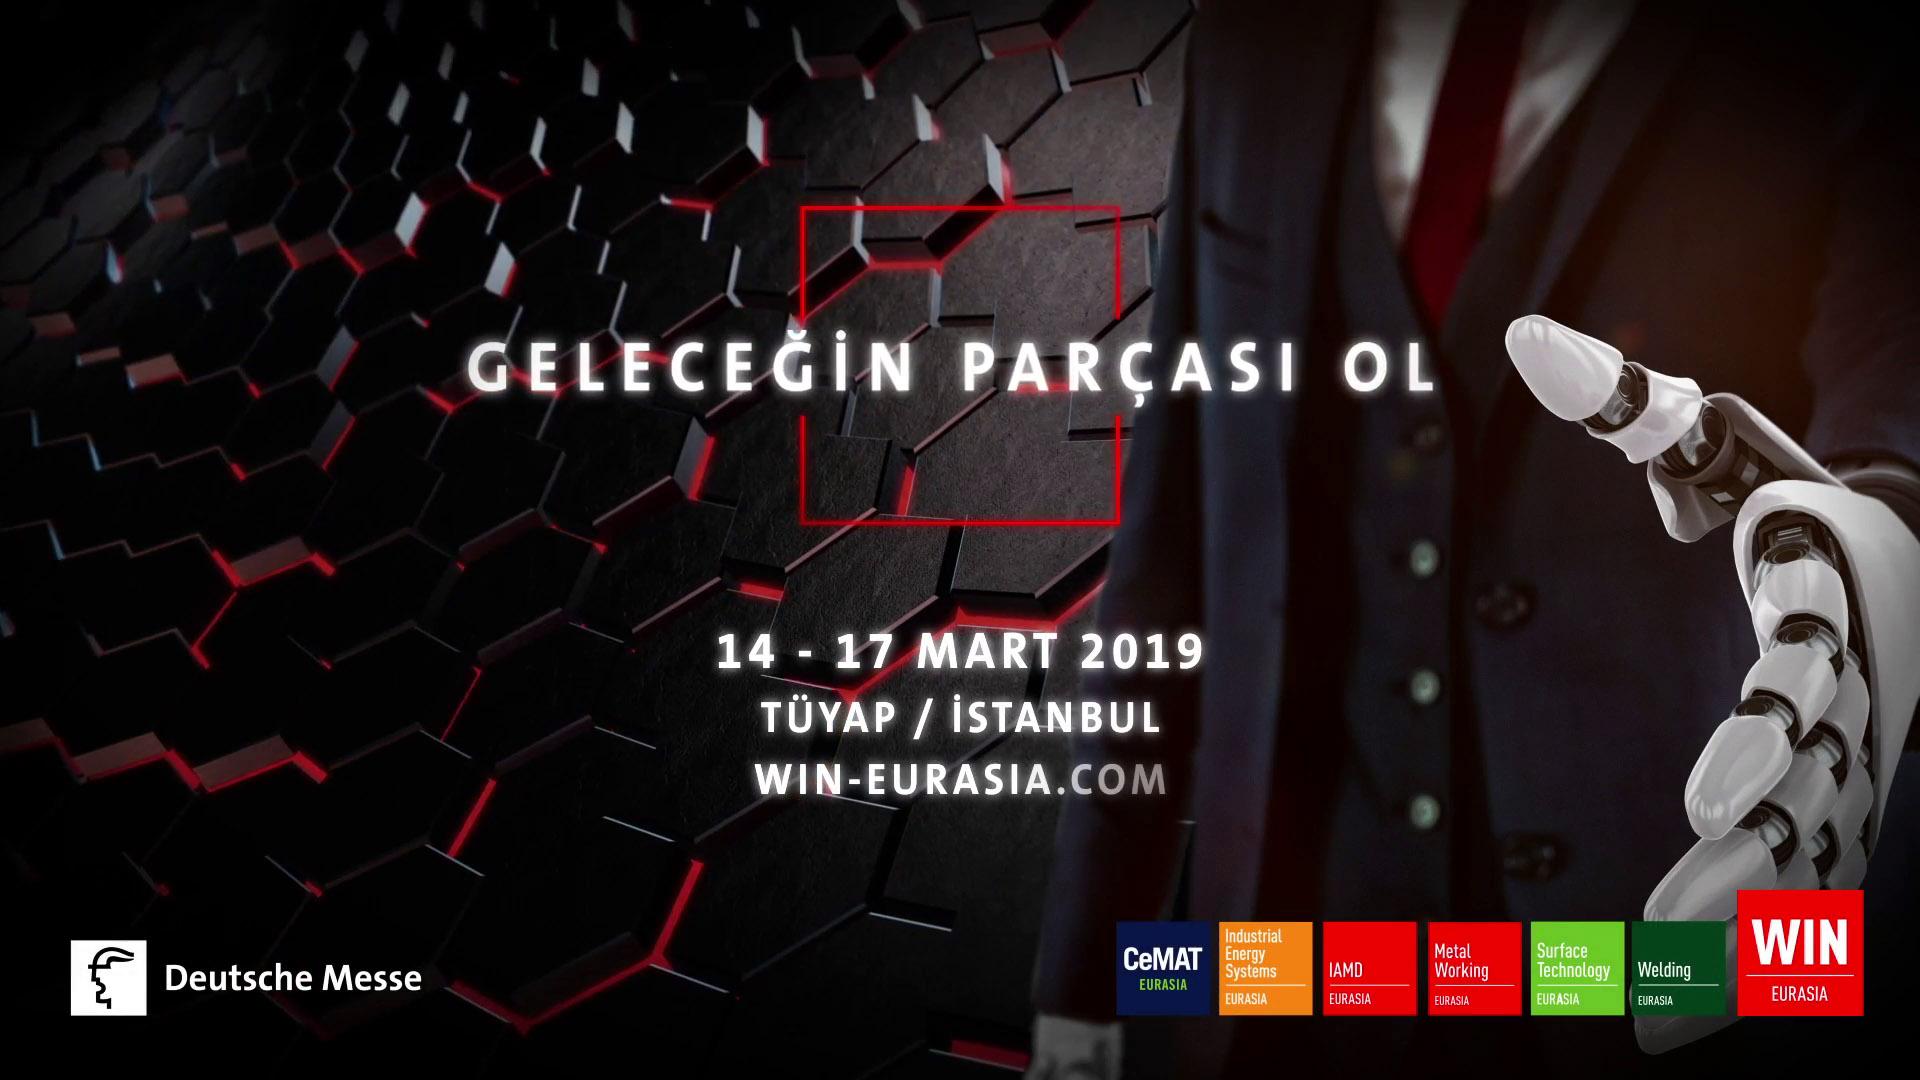 WIN EURASIA, 14 – 17 Mart 2019 / Tüyap Fuar ve Kongre Merkezi